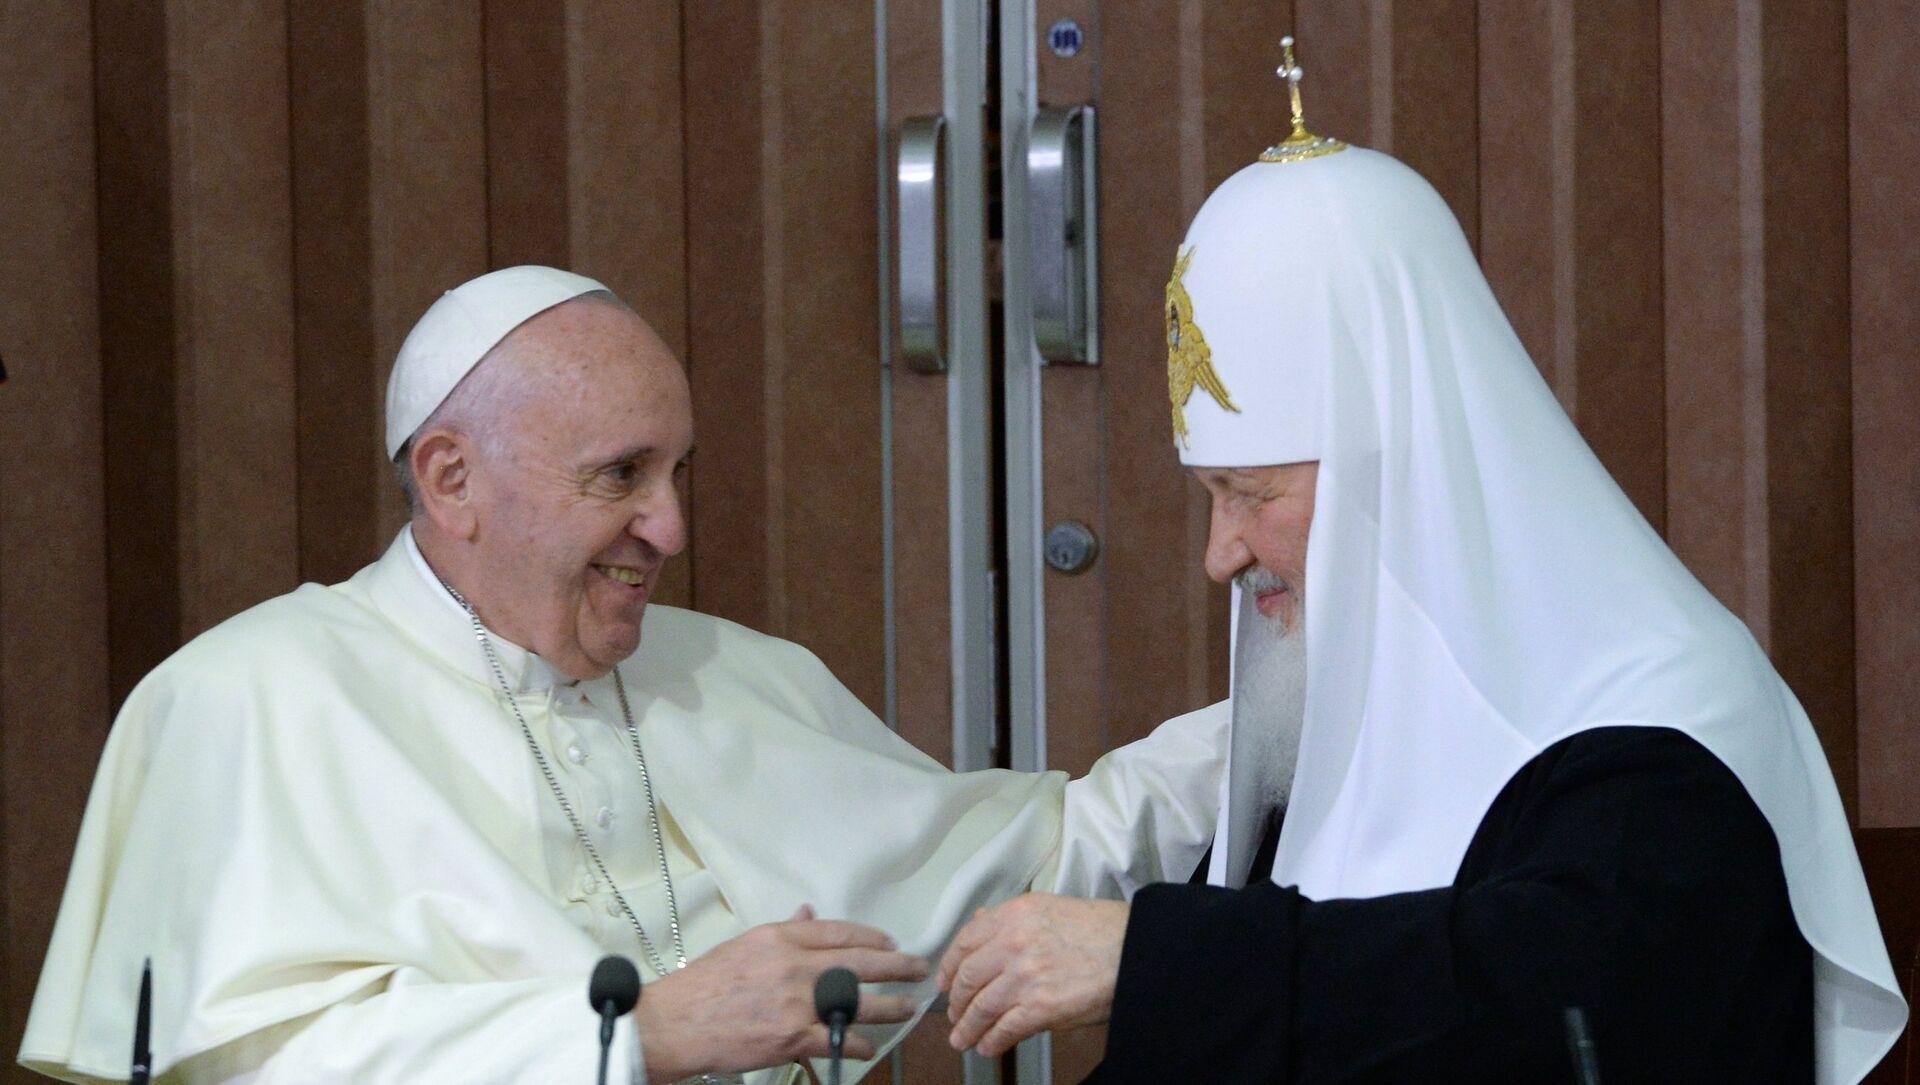 Il papa Francesco e il patriarca Kirill all'Avana - Sputnik Italia, 1920, 04.04.2021